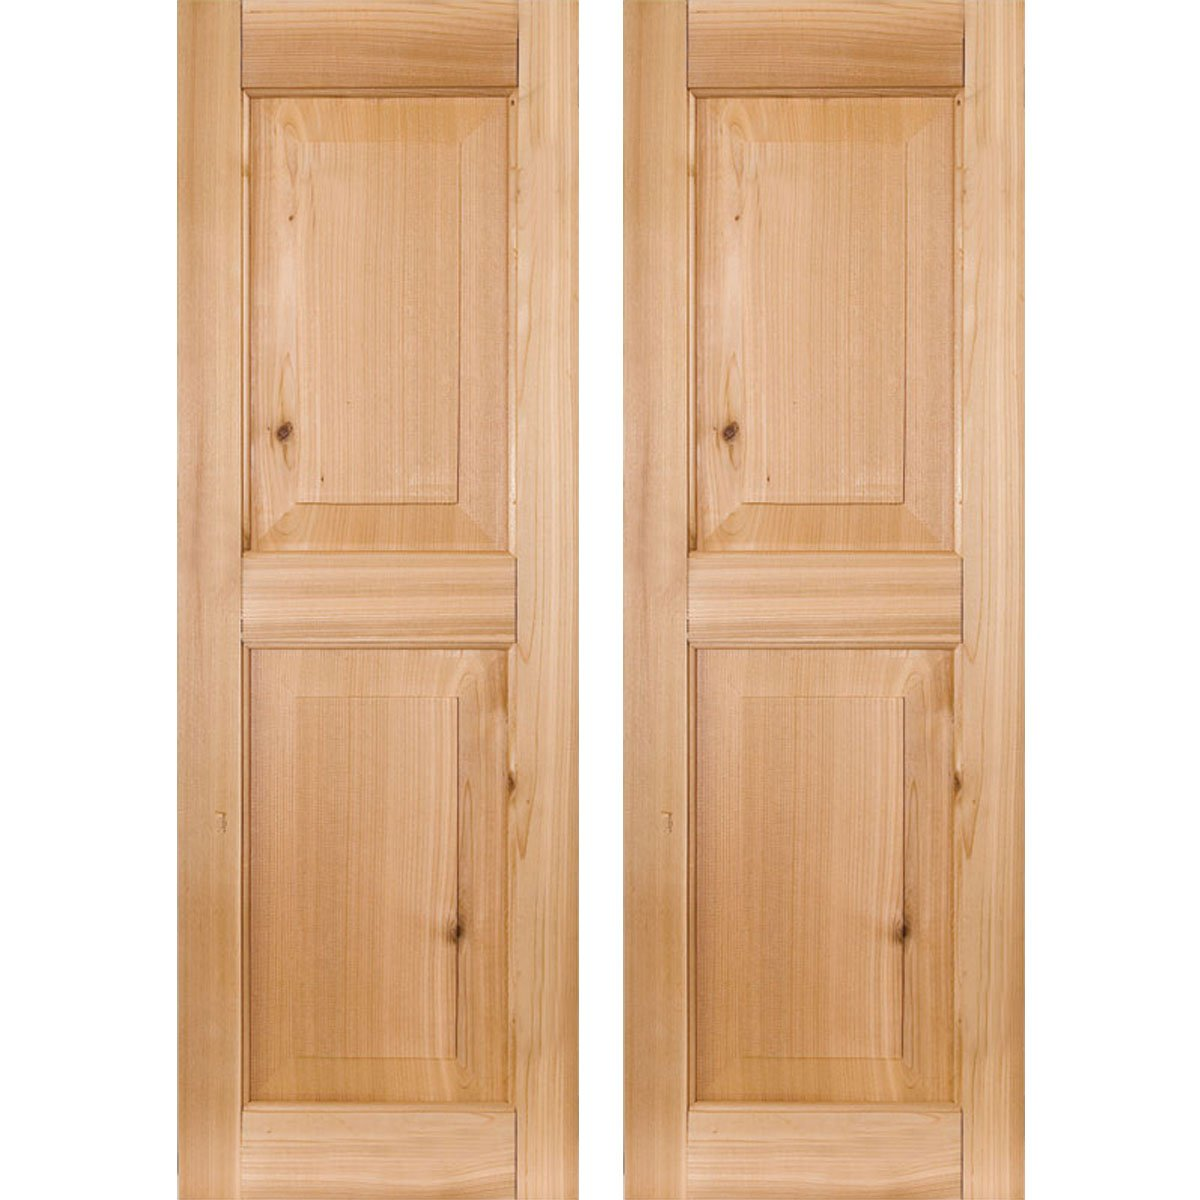 Ekena Millwork RWR15X067UNP Exterior Real Wood Pine